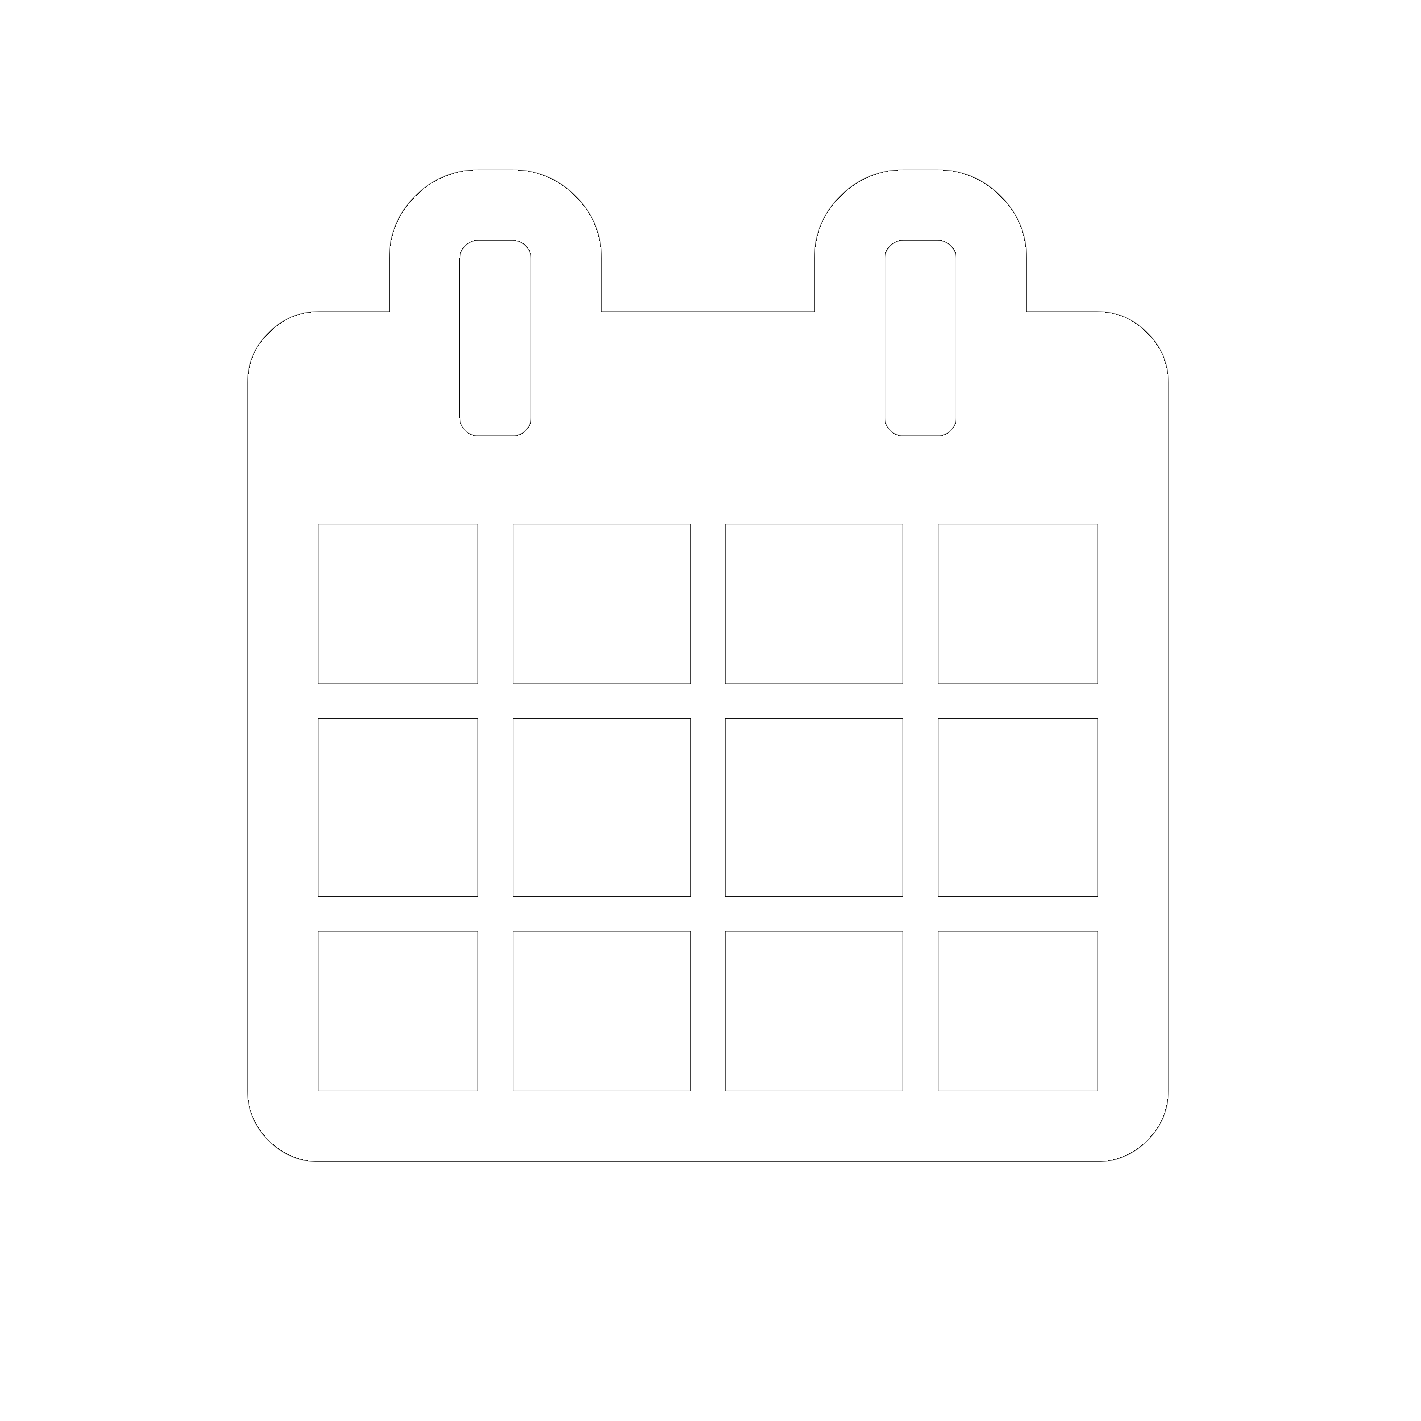 Wics asu. Clipart calendar calendar time